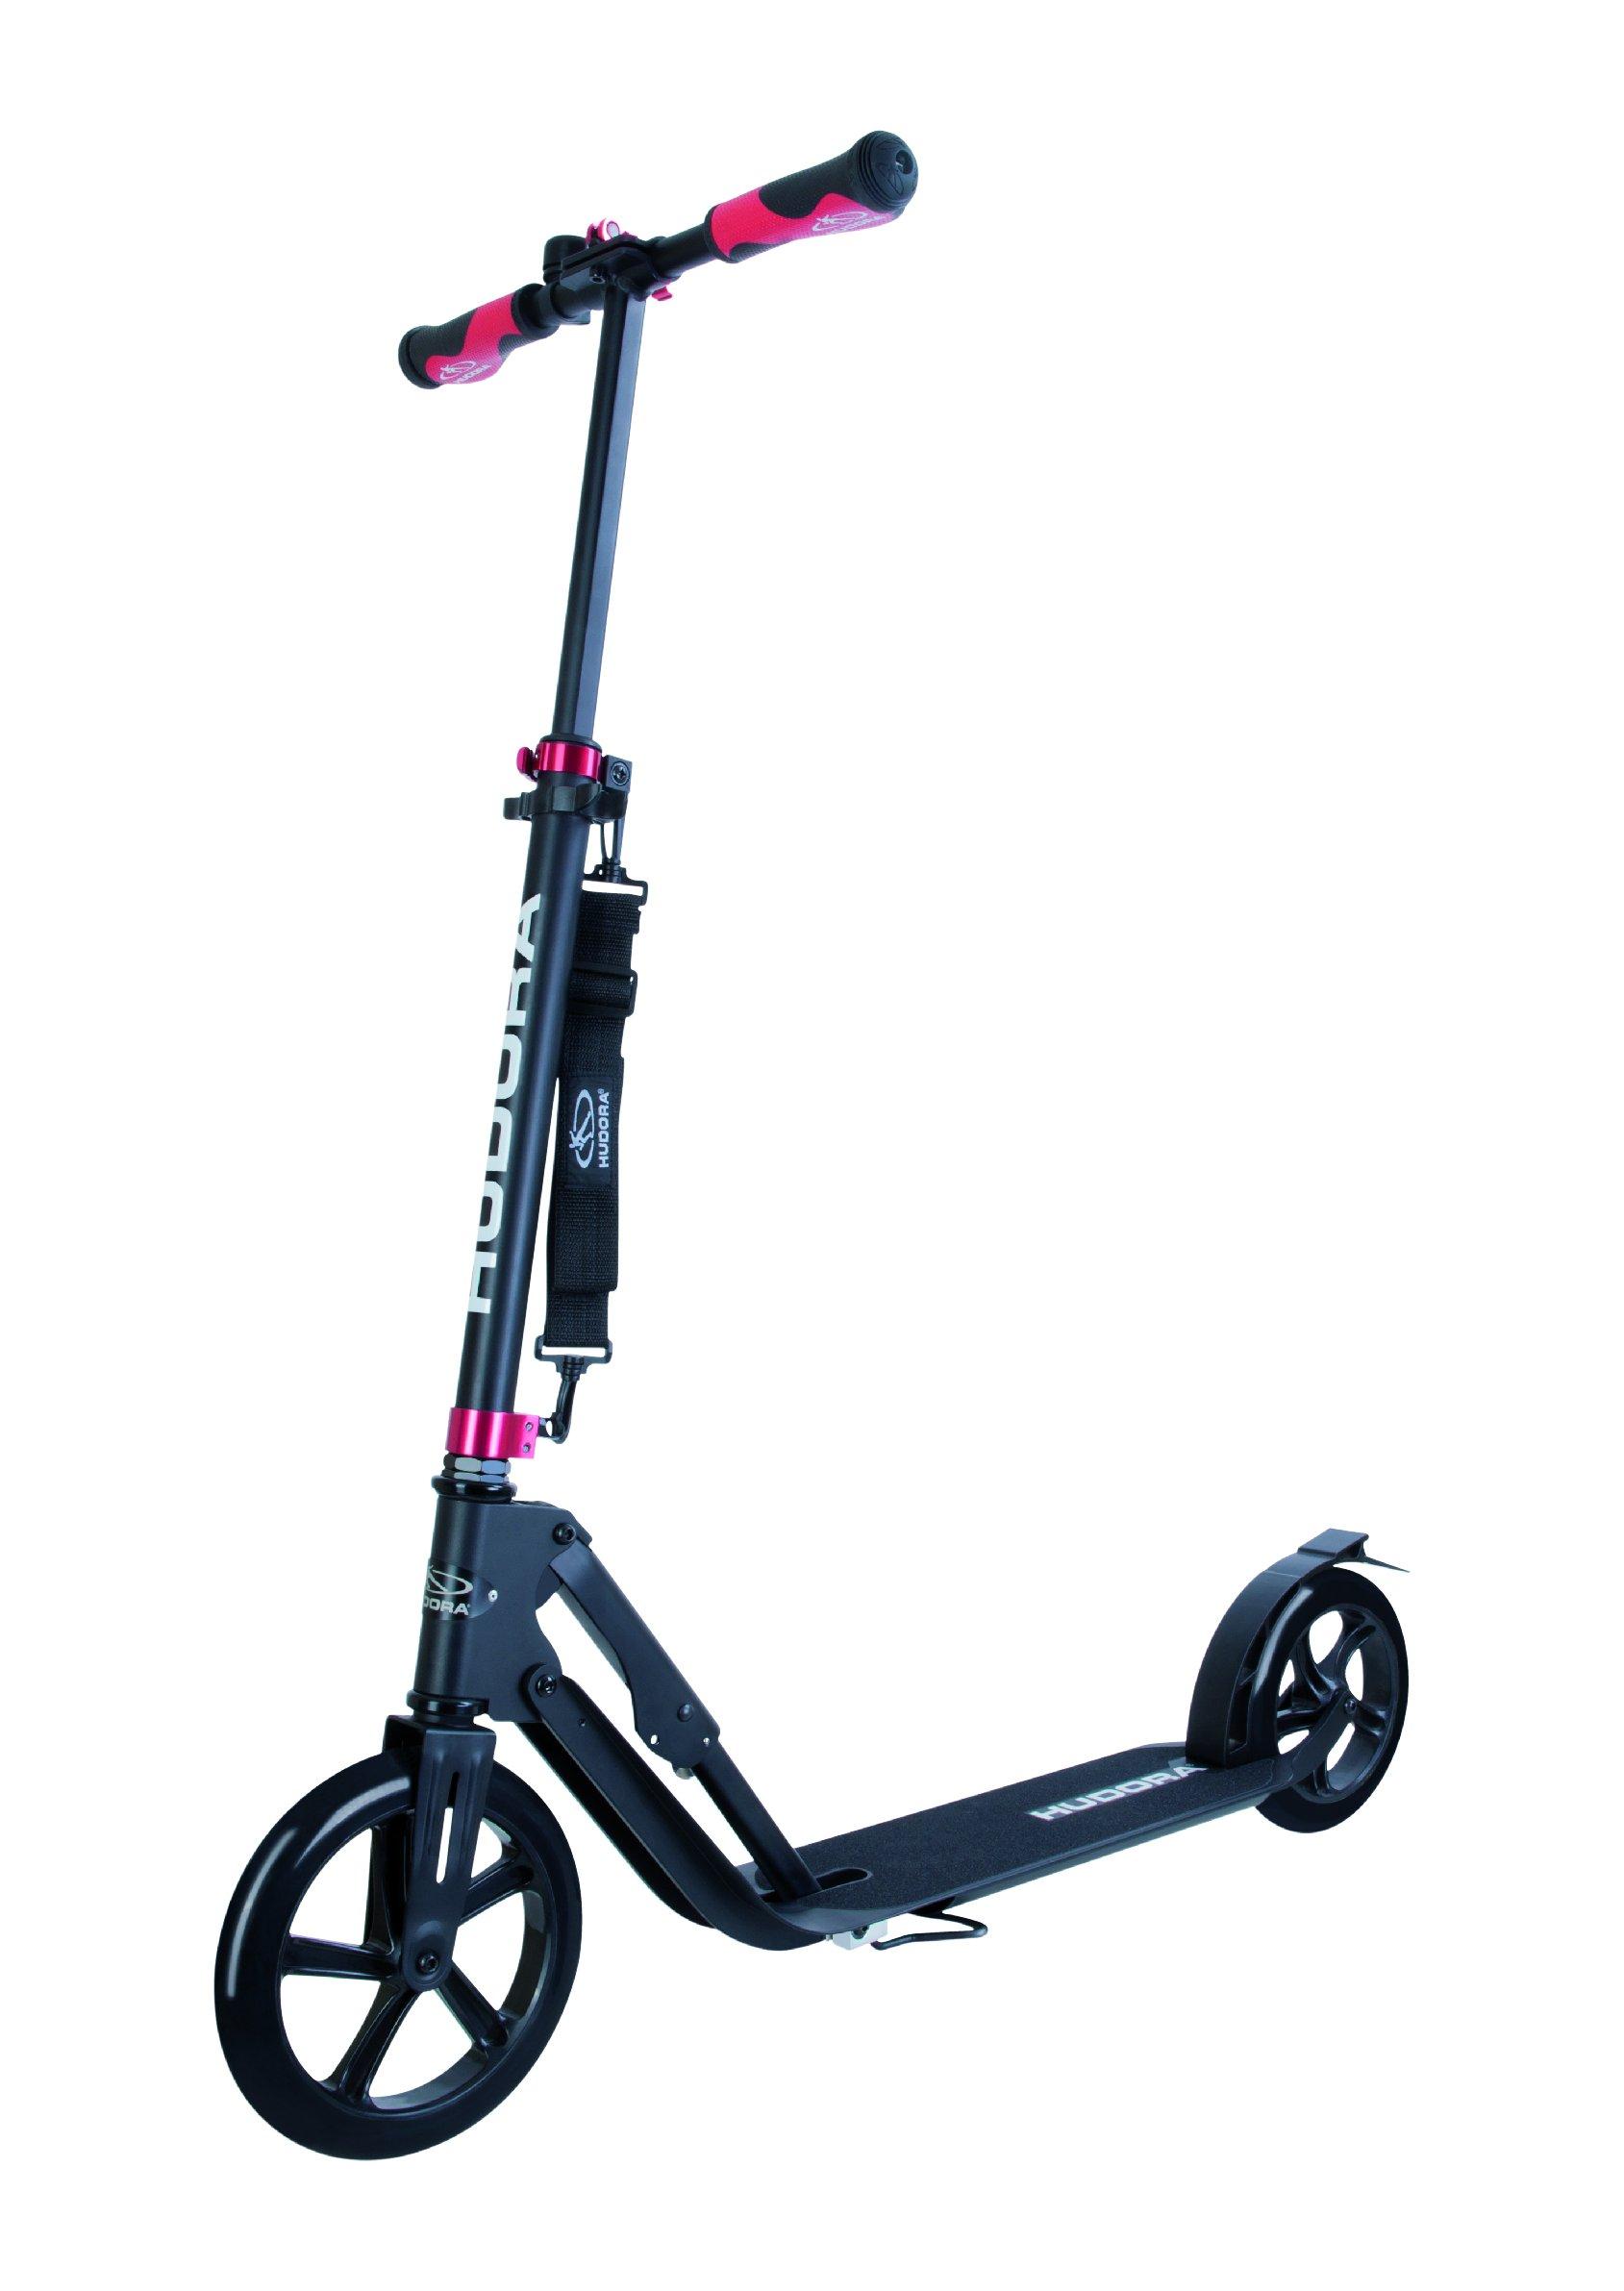 HUDORA 230 Adult Scooters Foldable Adjustable Kick Scooter Aluminum Outdoor use (Black)